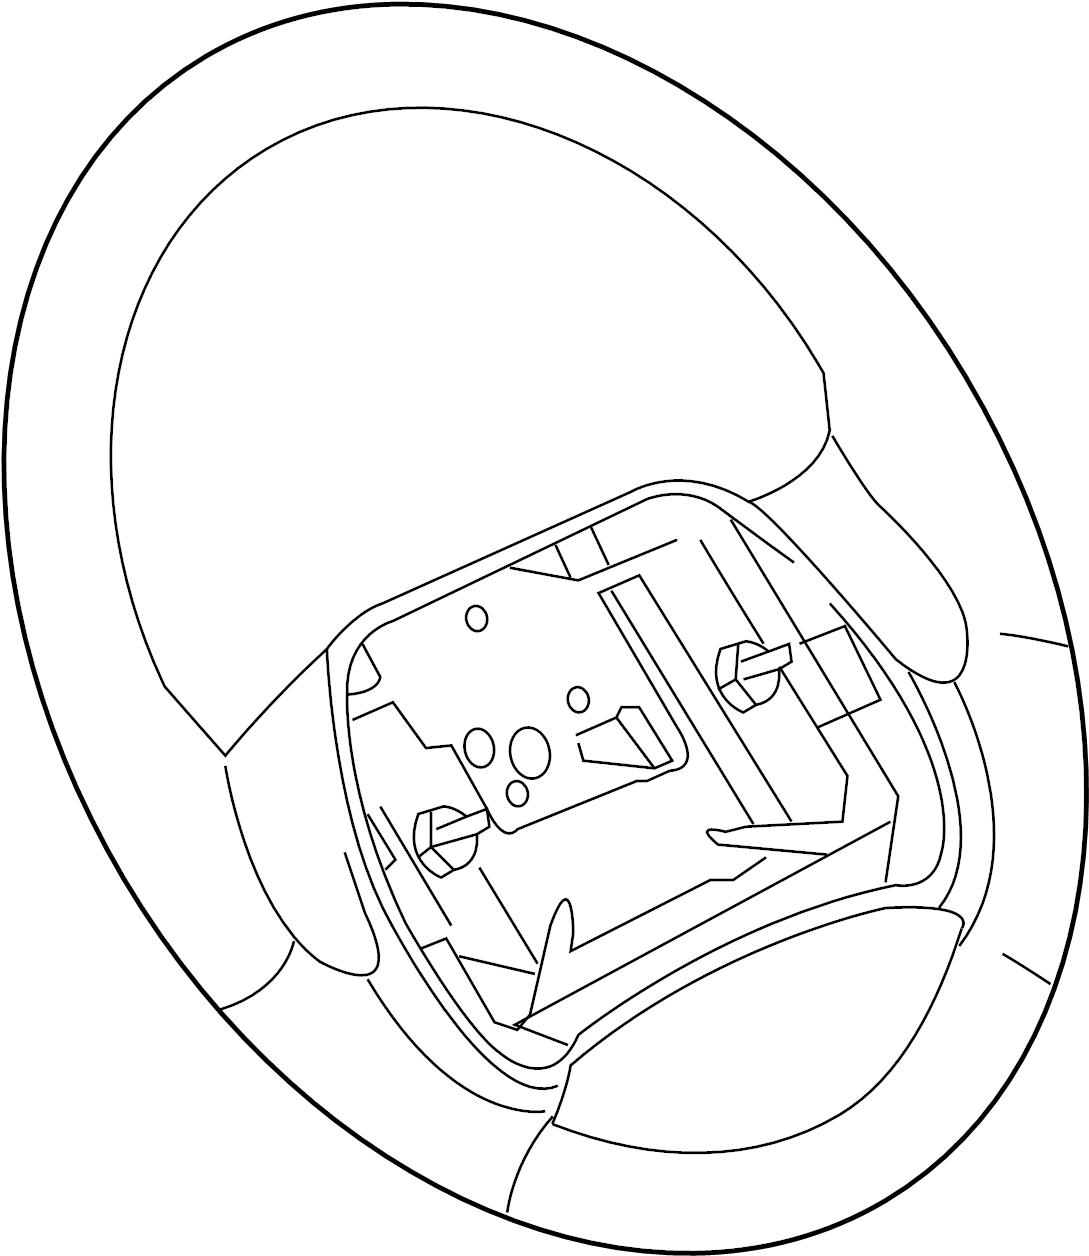 Chevrolet Cavalier Steering Wheel. Cavalier. Graphite